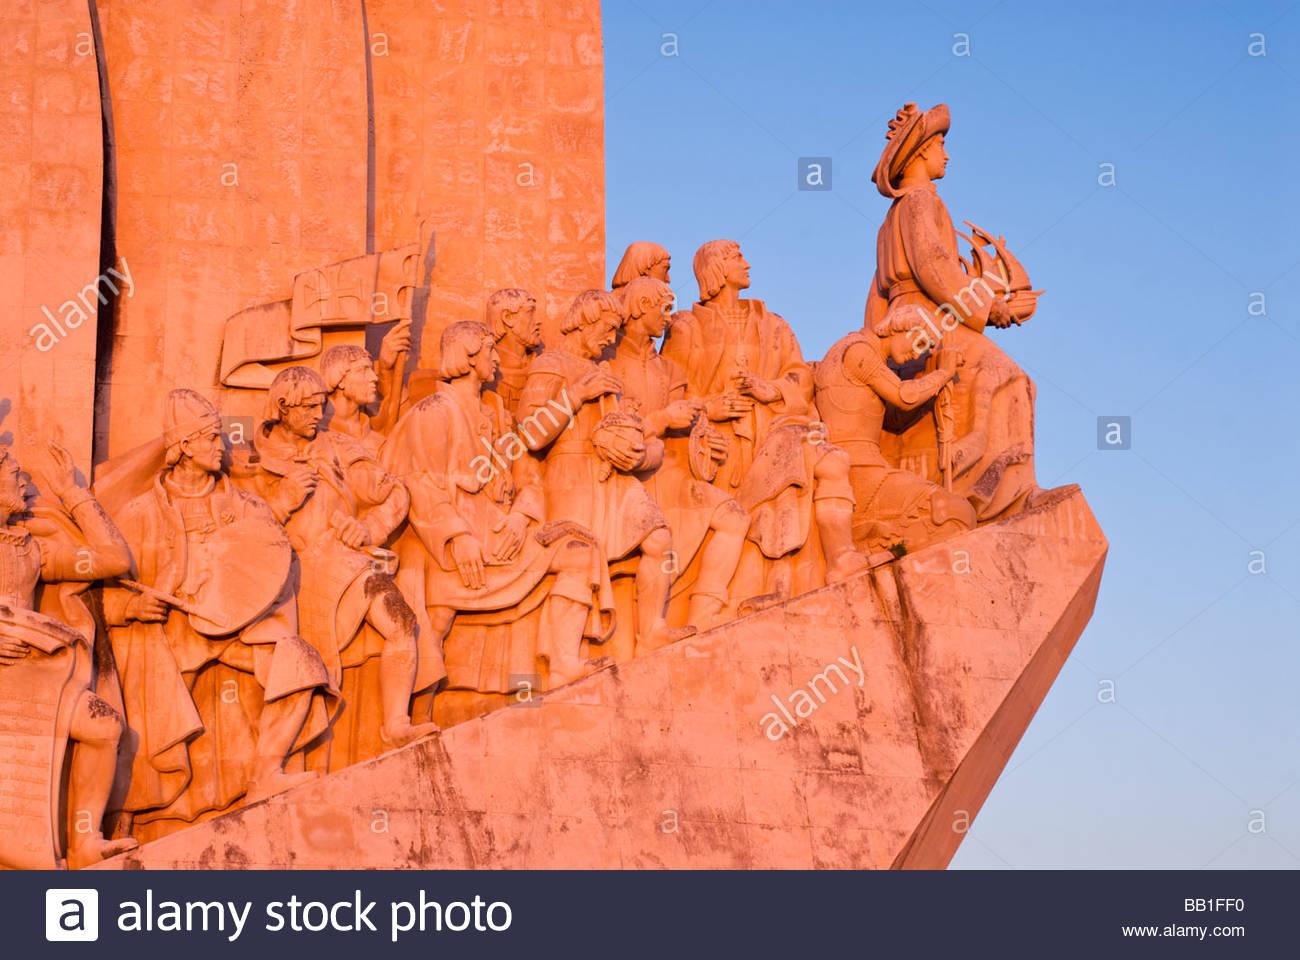 Monument to the Discoveries, Belém, Lisbon, Portugal. - Stock Image